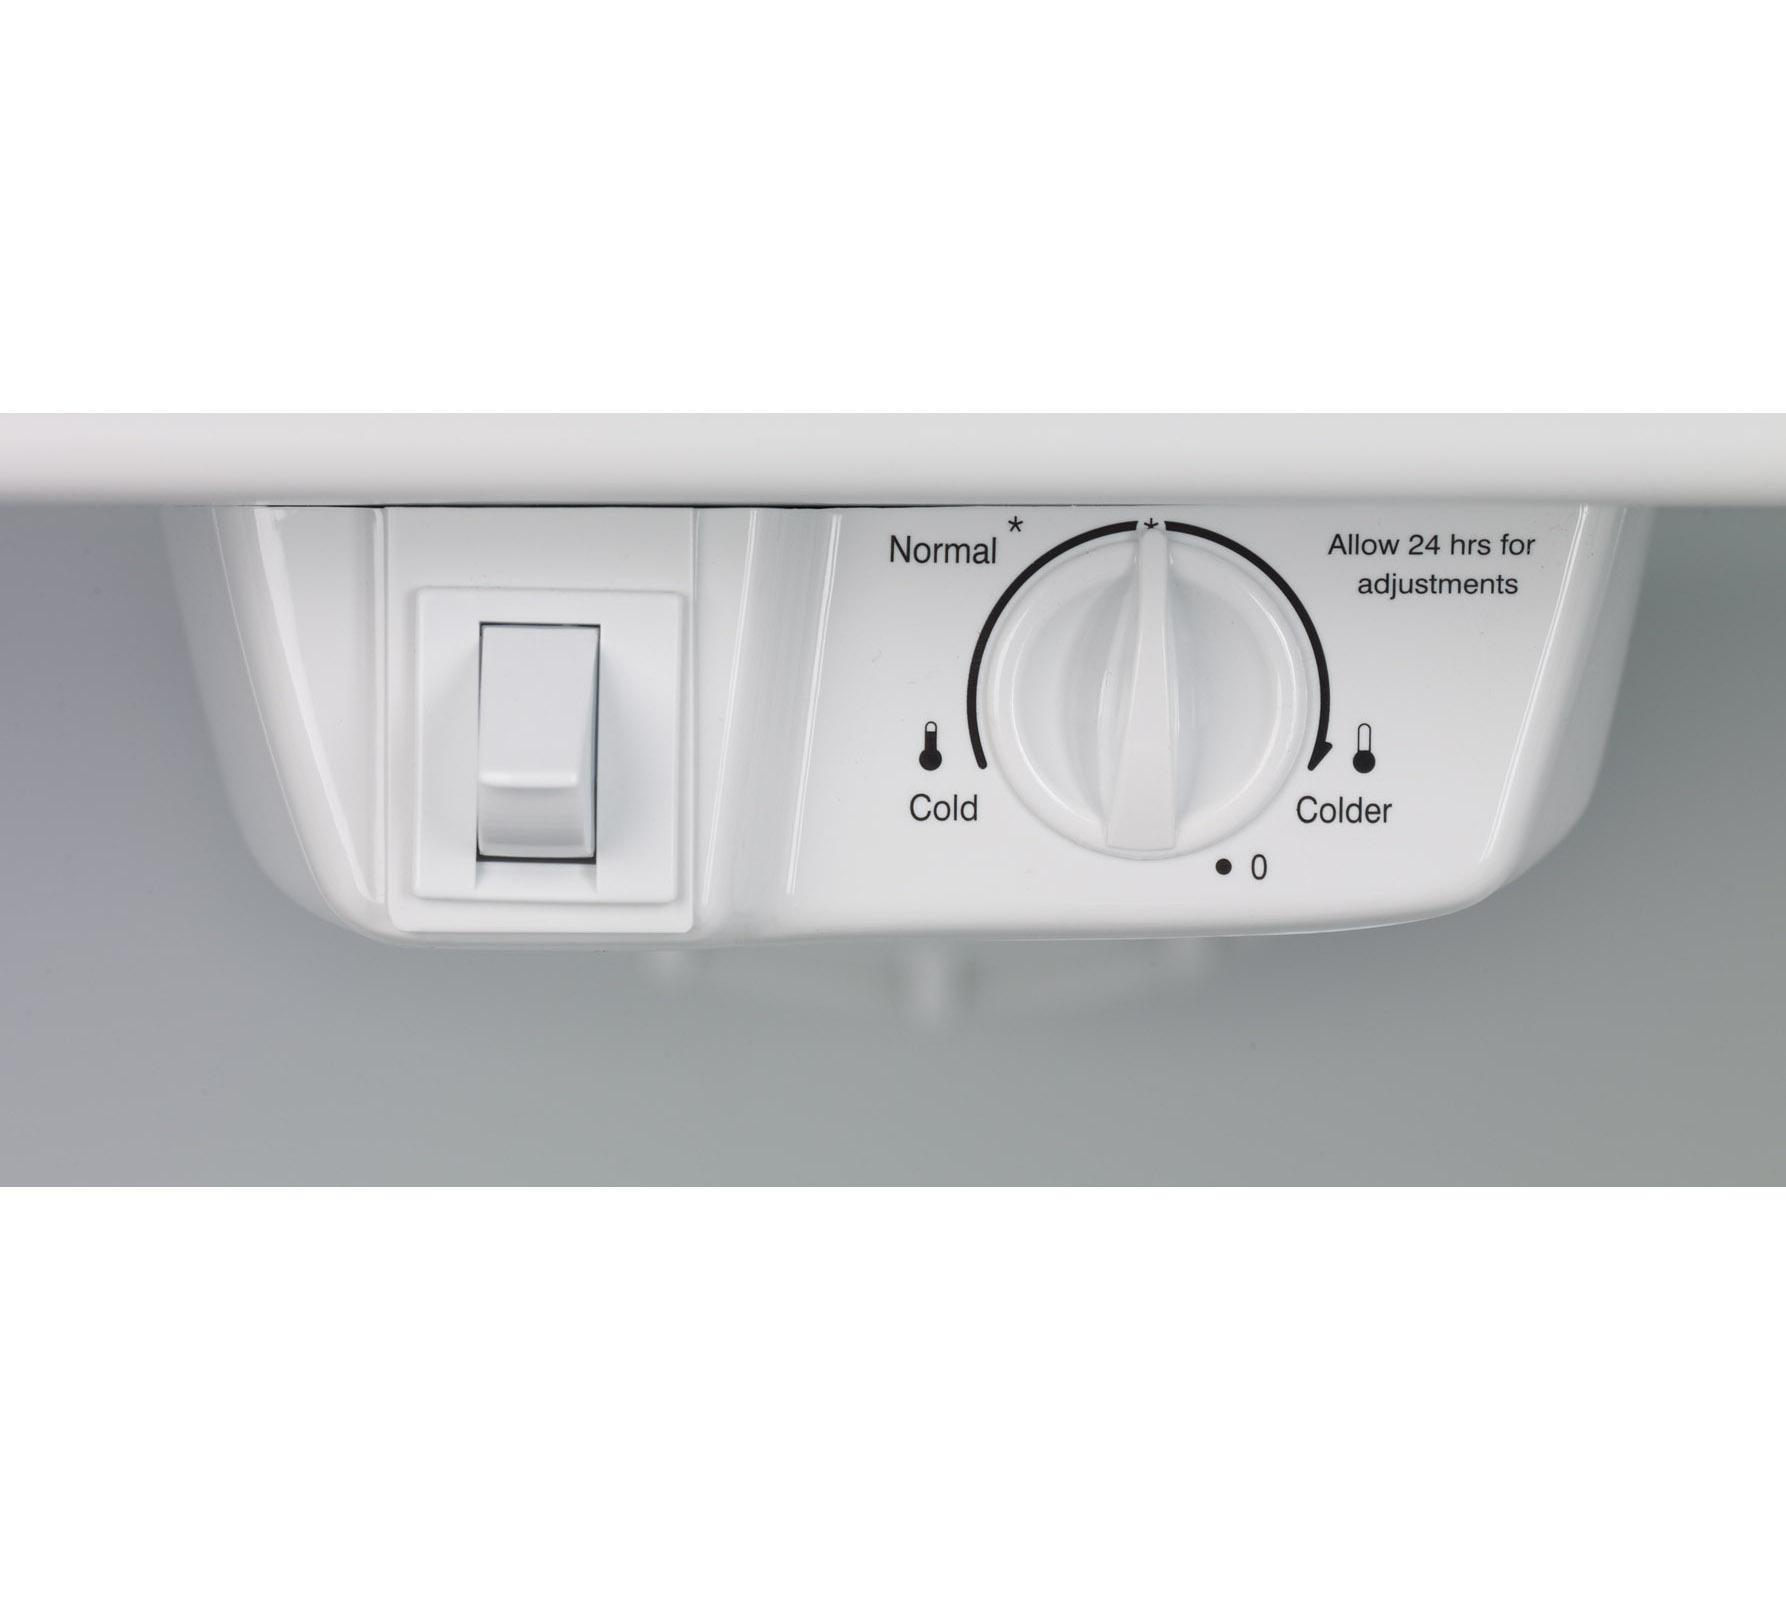 Frigidaire FFHT1614QW 16.3 cu. ft. Top-Mount Refrigerator - White